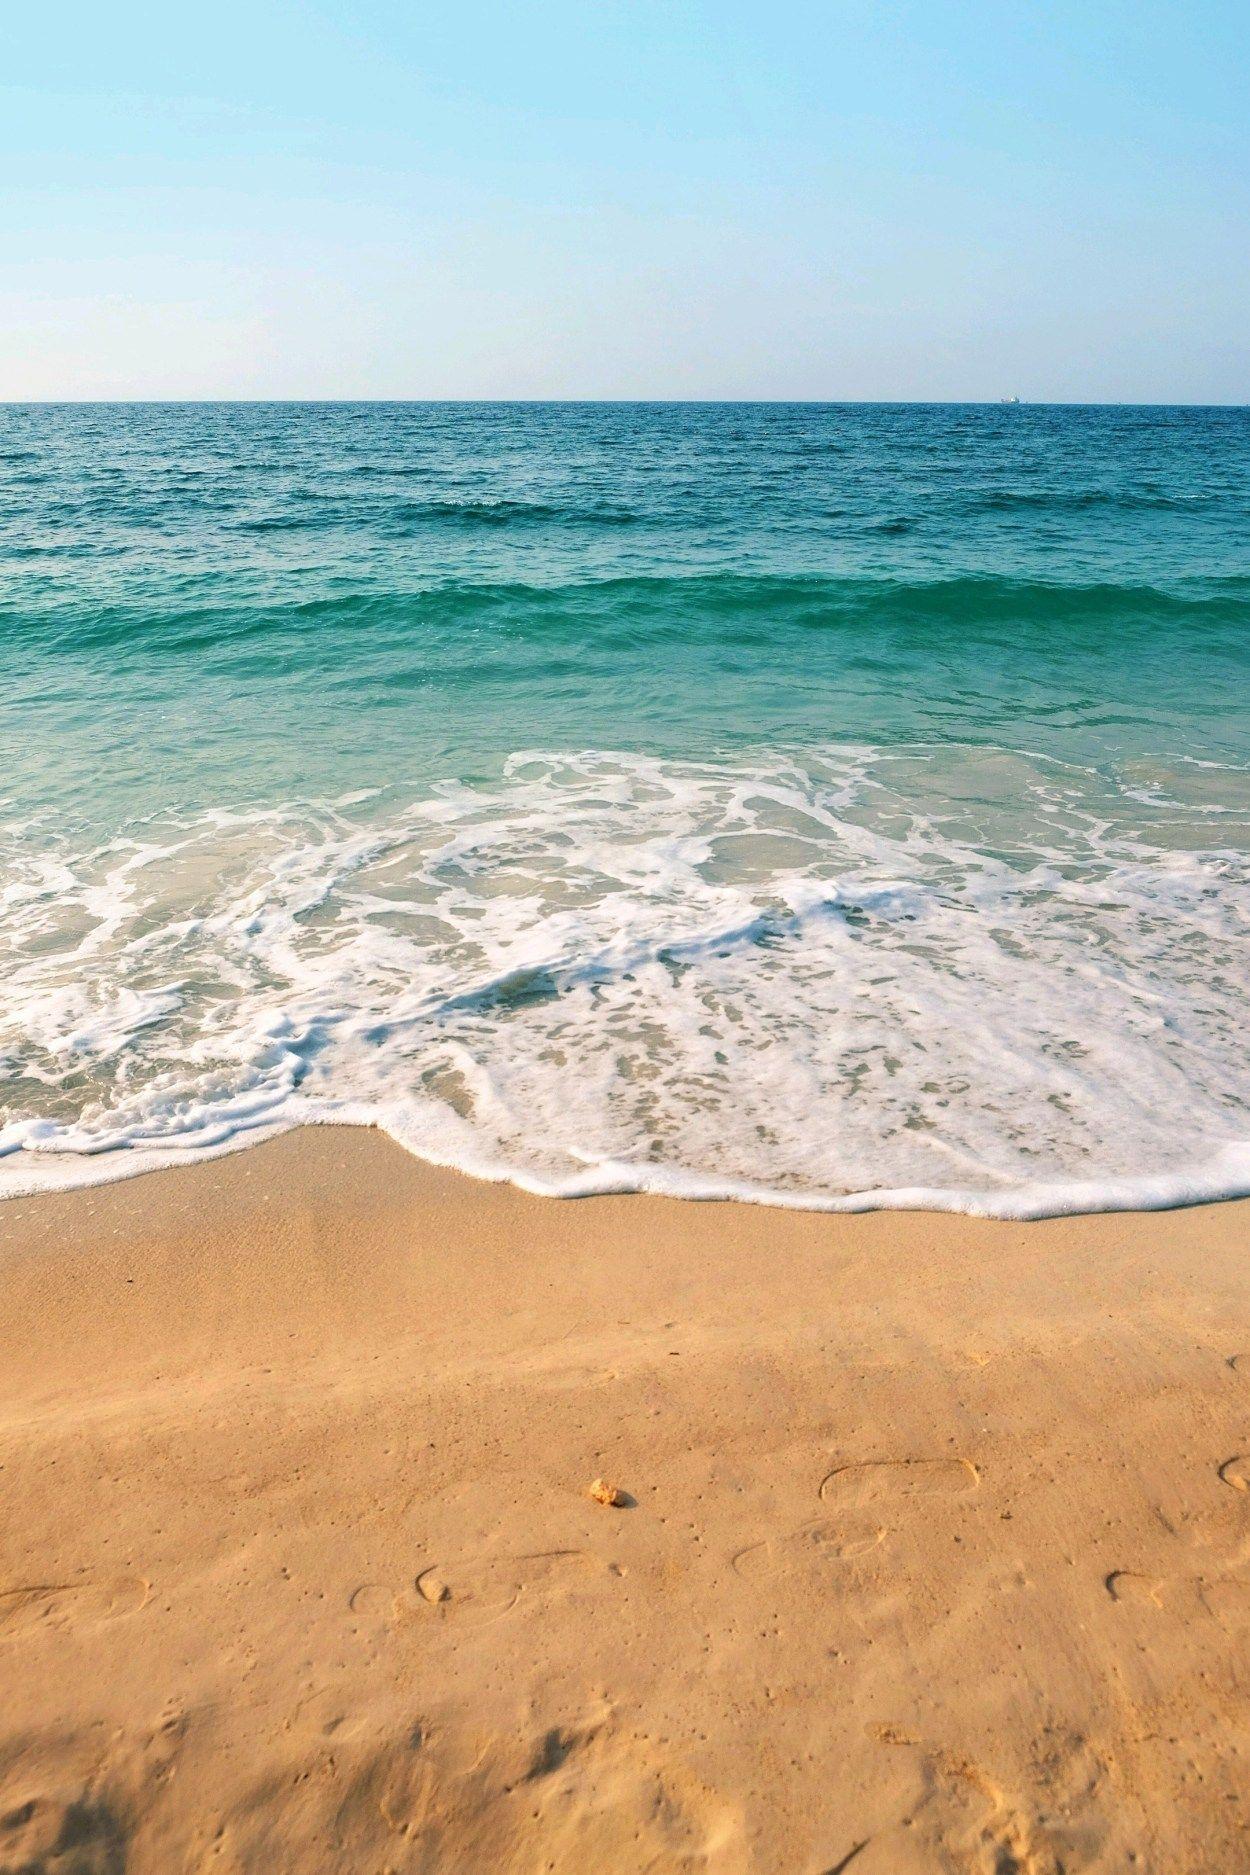 Wallpapers Fondos De Pantalla Paisajes 4k Y Hd Para Celular Papel Mural De Playa Playa Fondos Fotografia De Playa